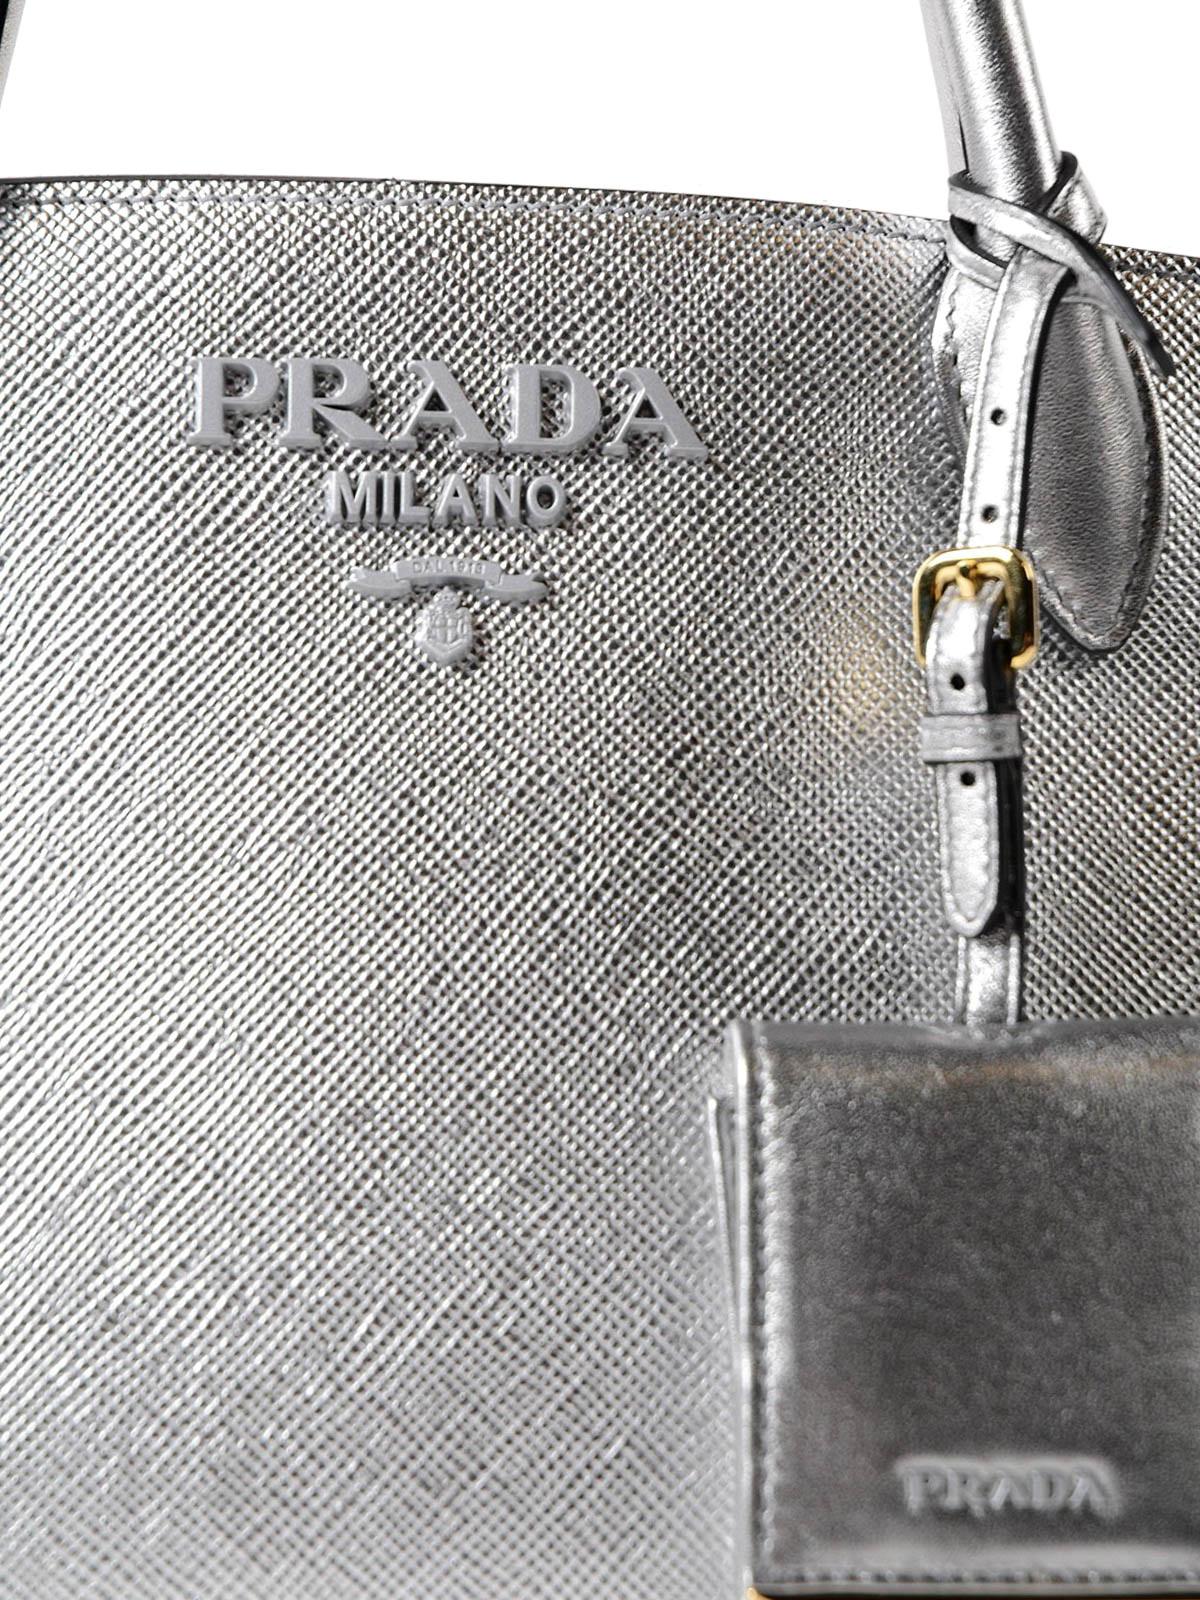 Prada City silver calfskin handbag uJi52